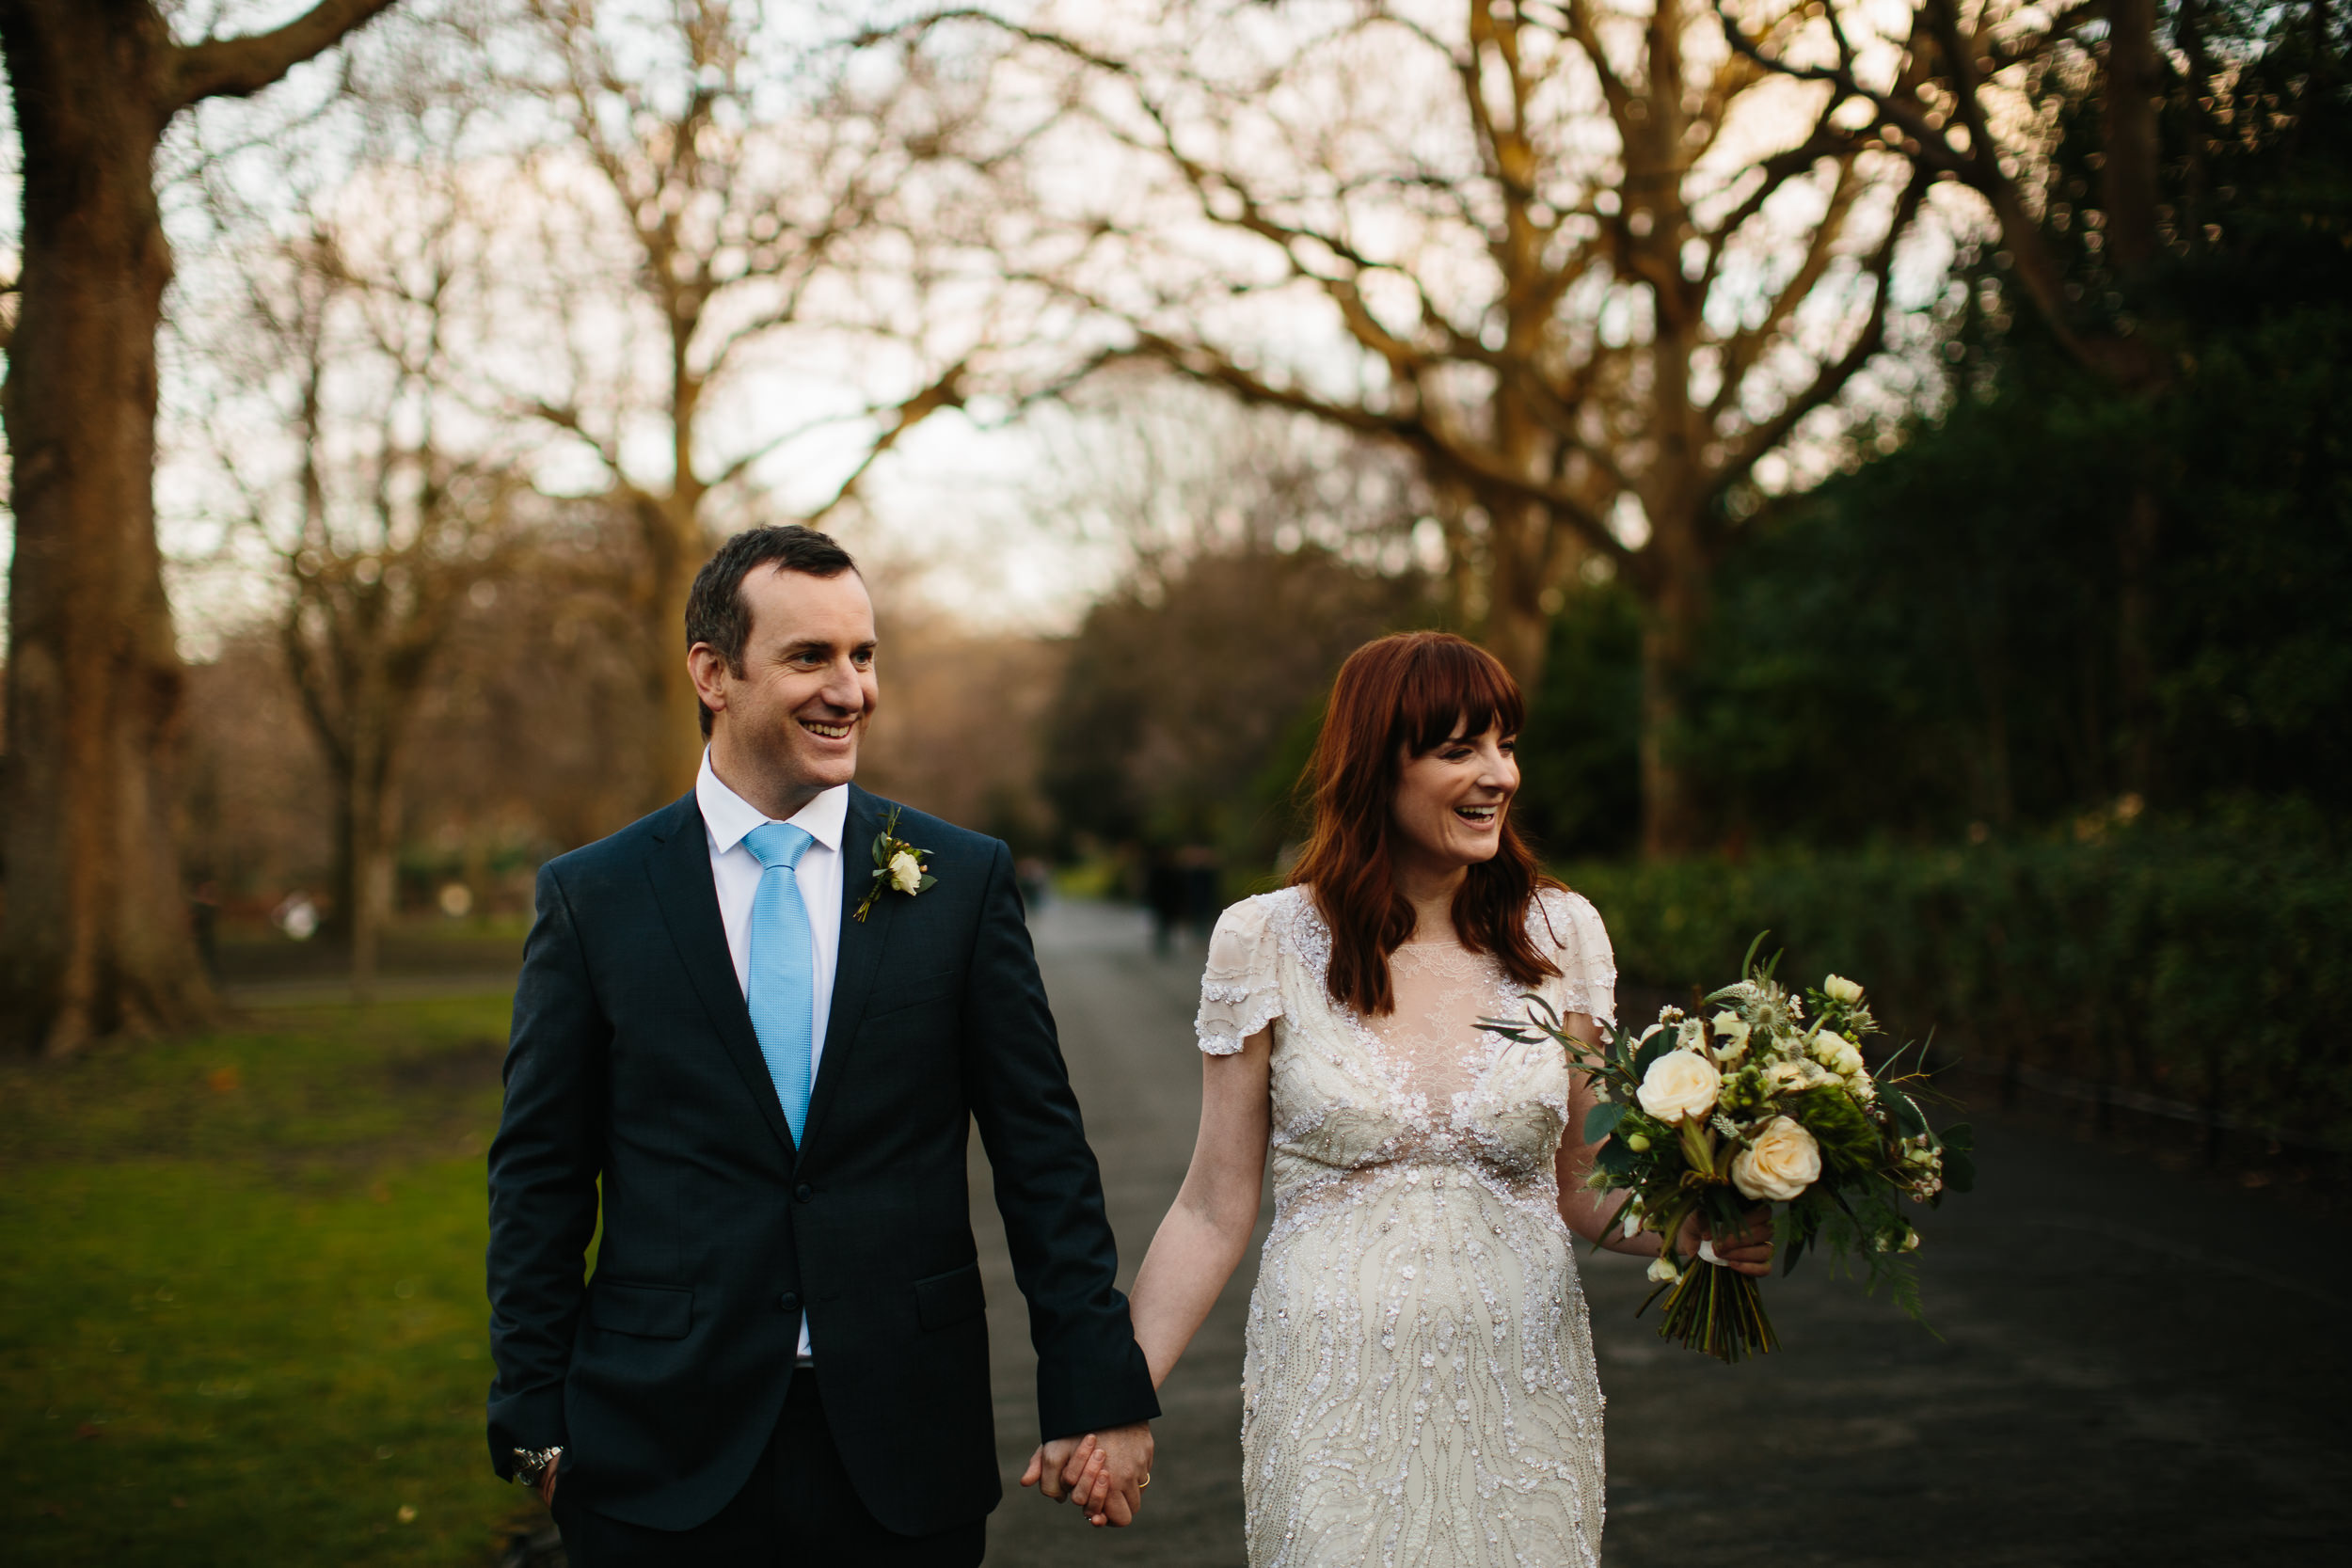 Susan & Johnny // Wedding // Marco Pierre White